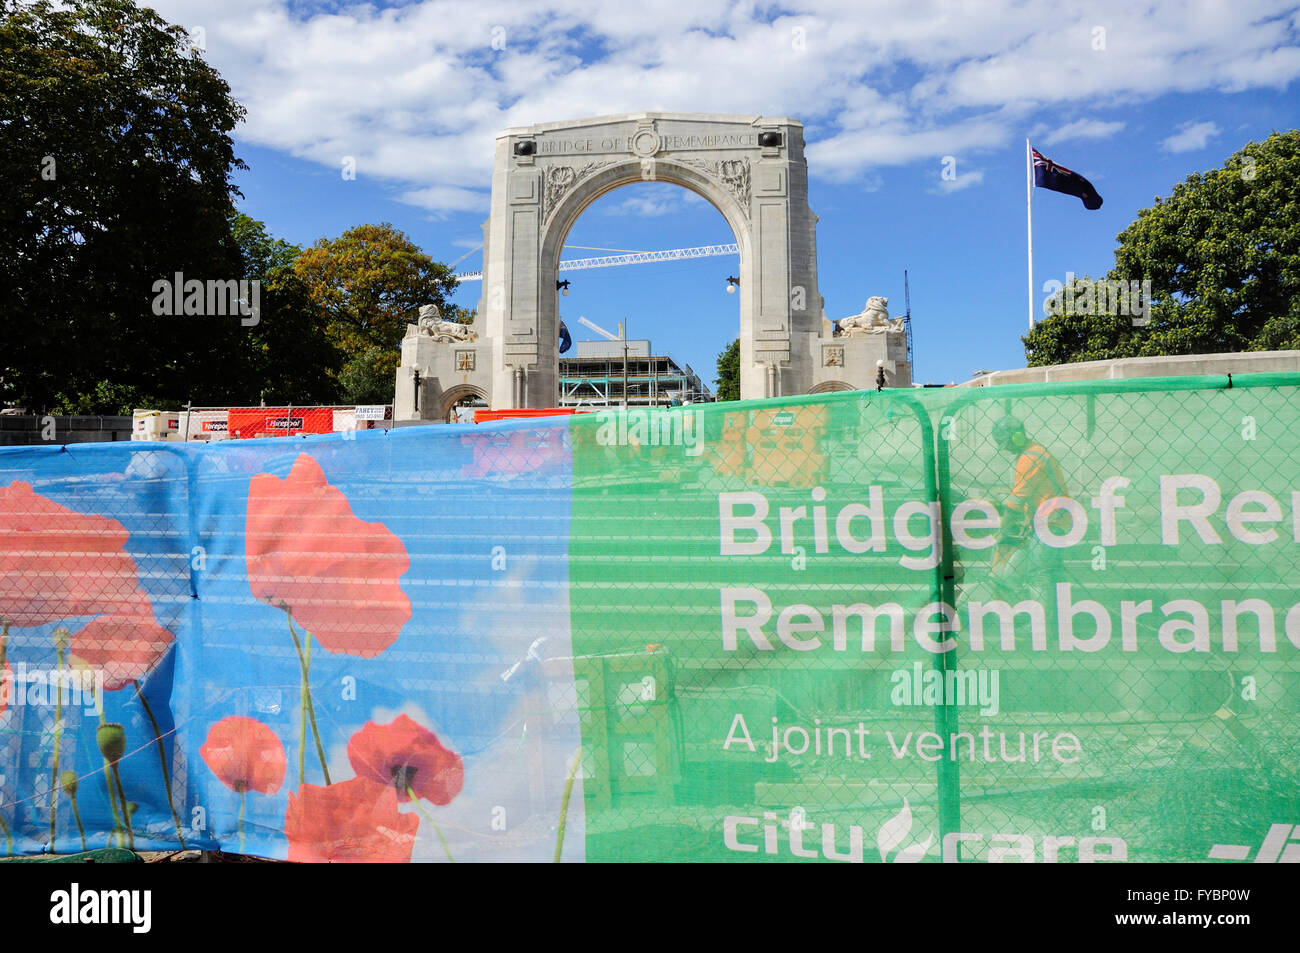 Wiederaufbau der Brücke der Erinnerung nach 2011 Erdbeben, Cashel Street, Christchurch, Canterbury, Neuseeland Stockbild